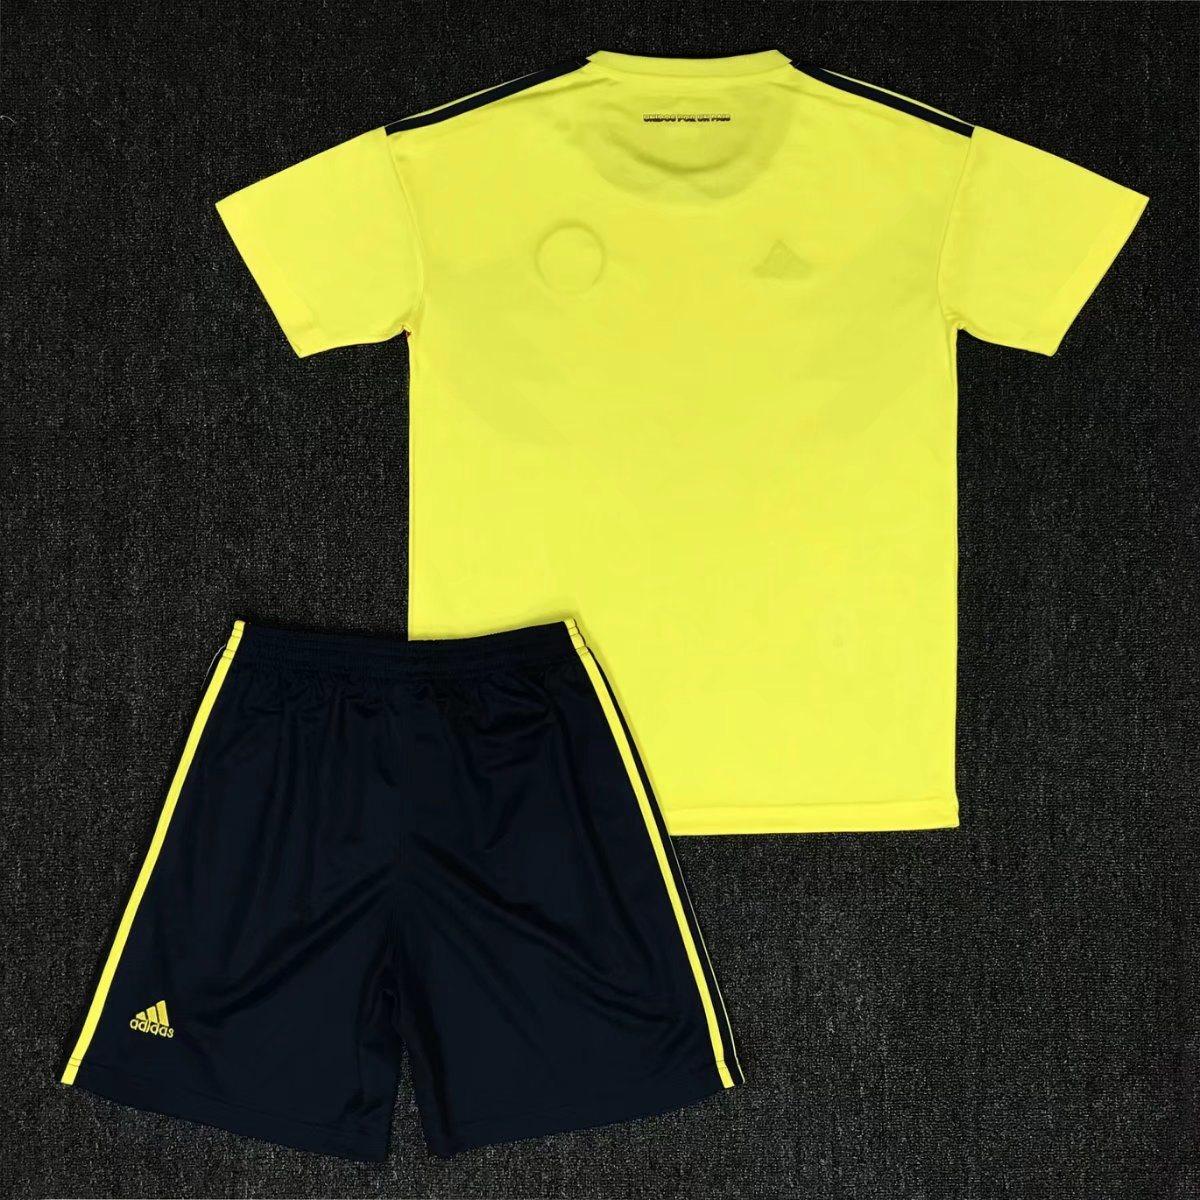 a5b9b91c6619 Adidas Soccer Jerseys Wholesale